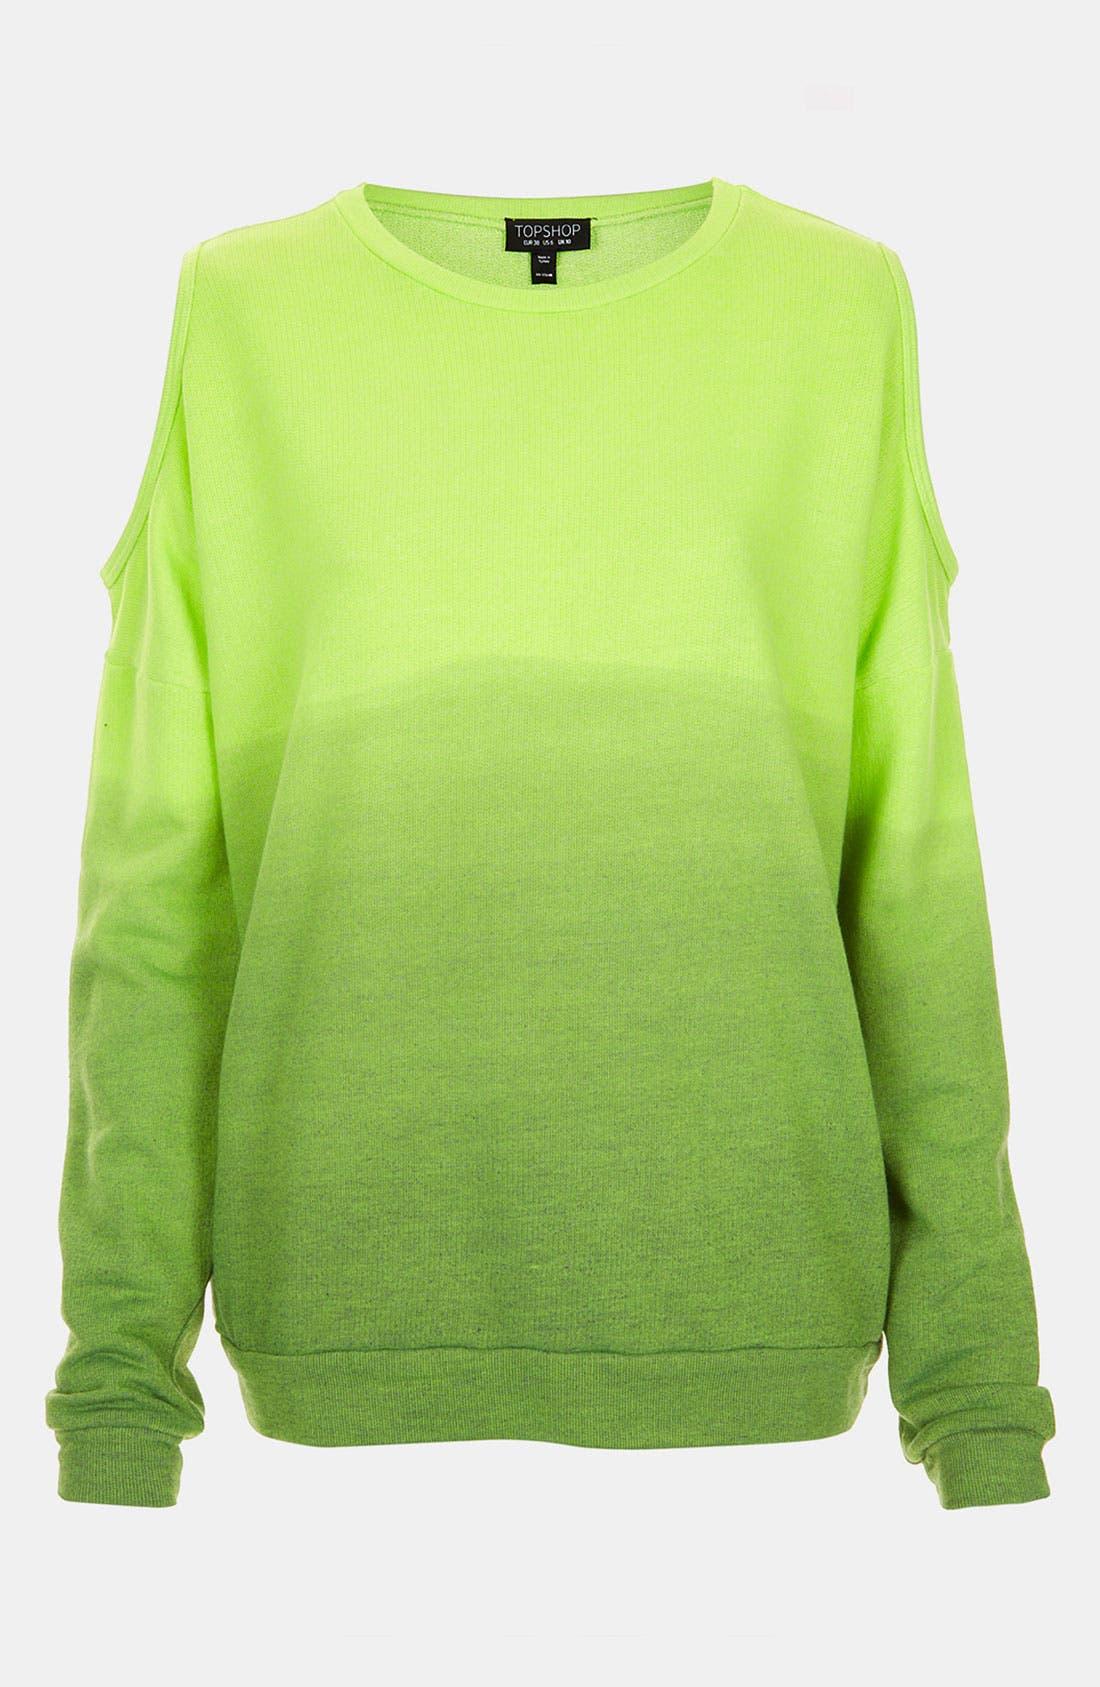 Main Image - Topshop Dip Dye Cutout Sweatshirt